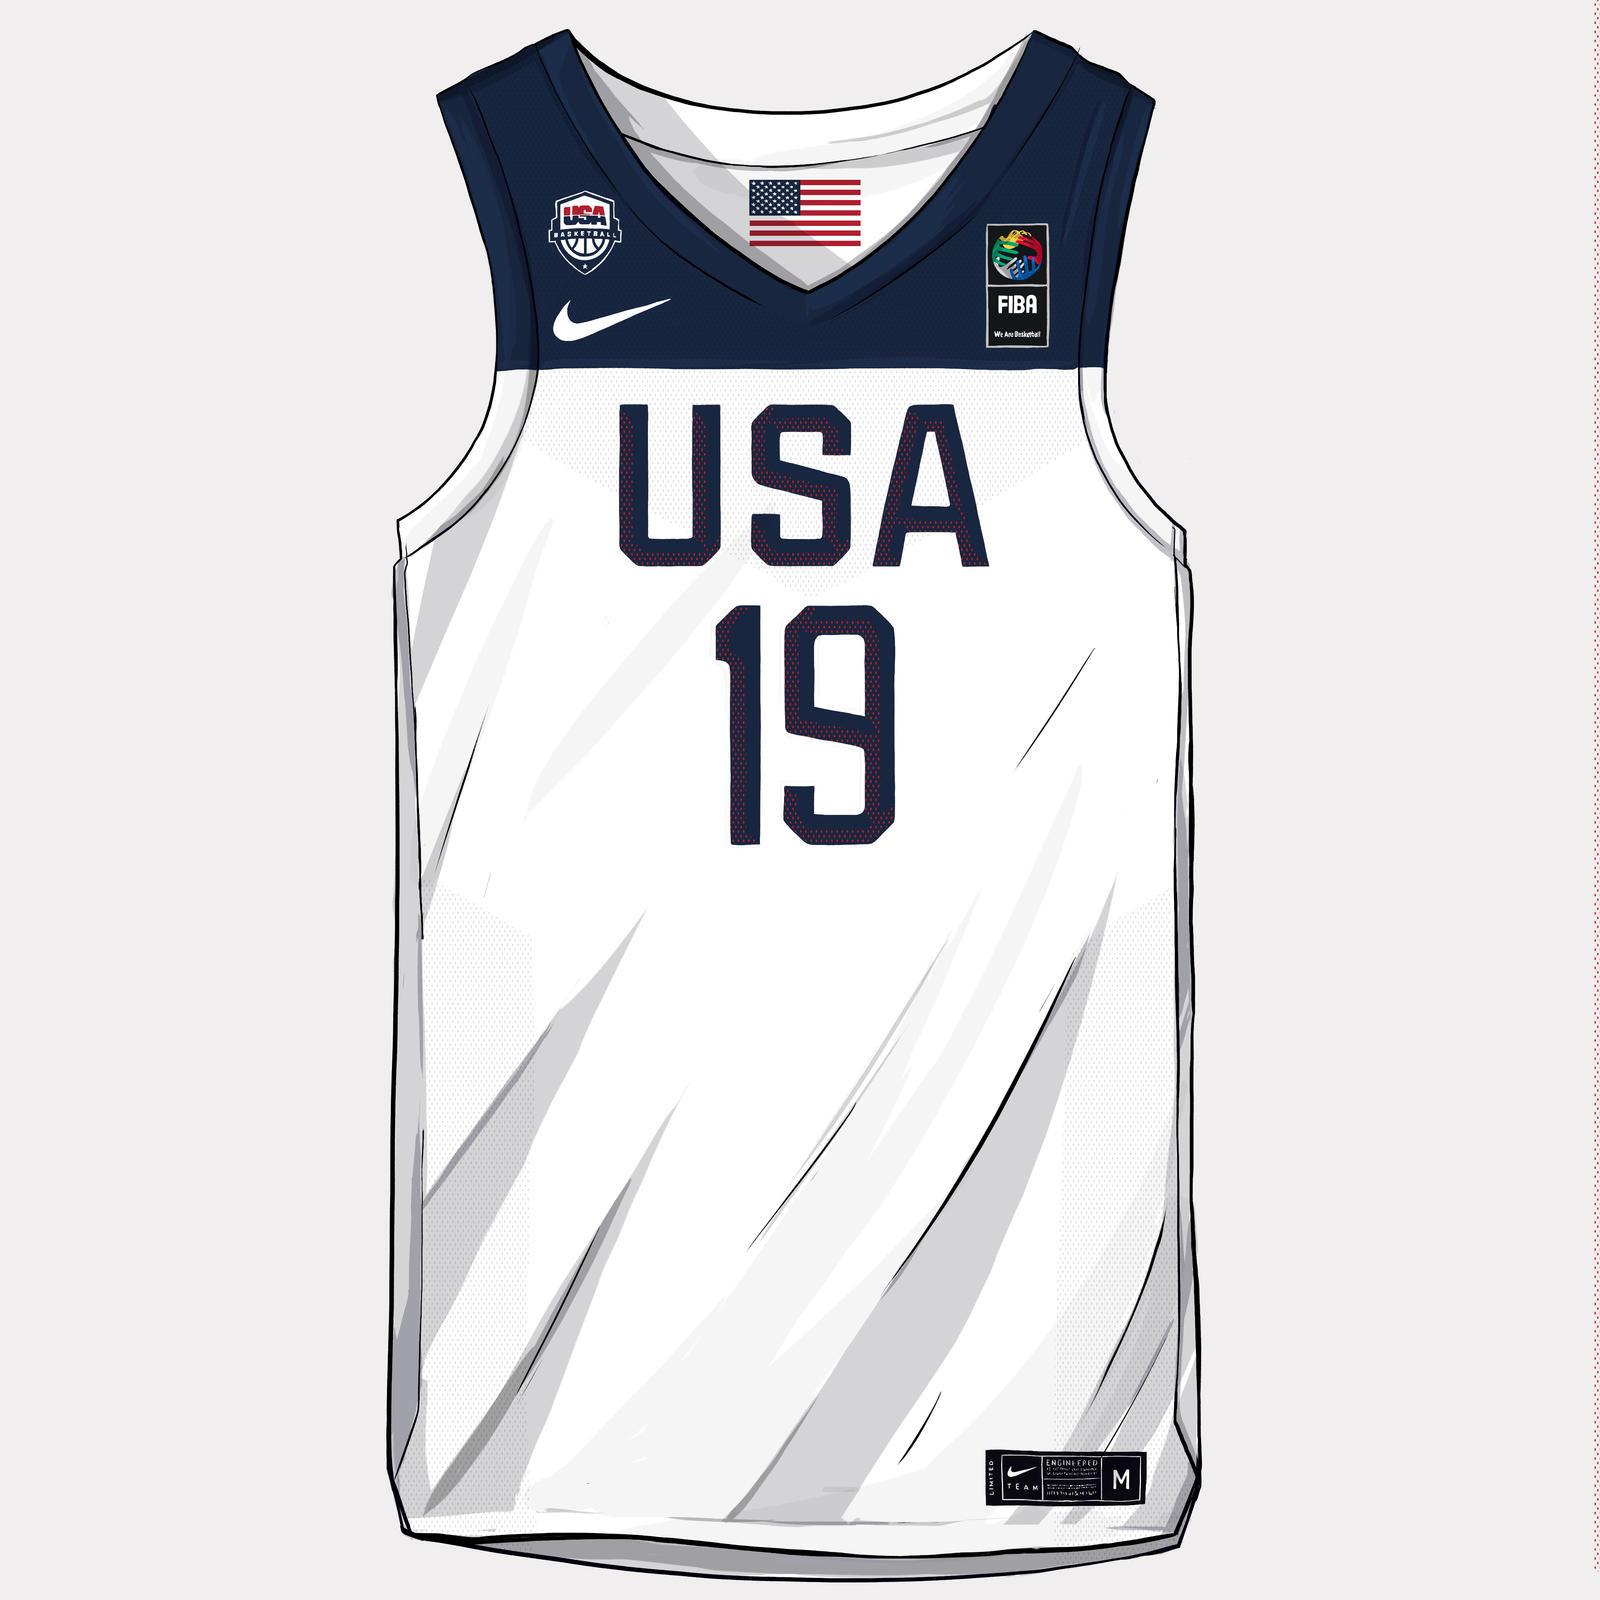 Nike and Jordan Brand Basketball Federation Uniforms China 2019